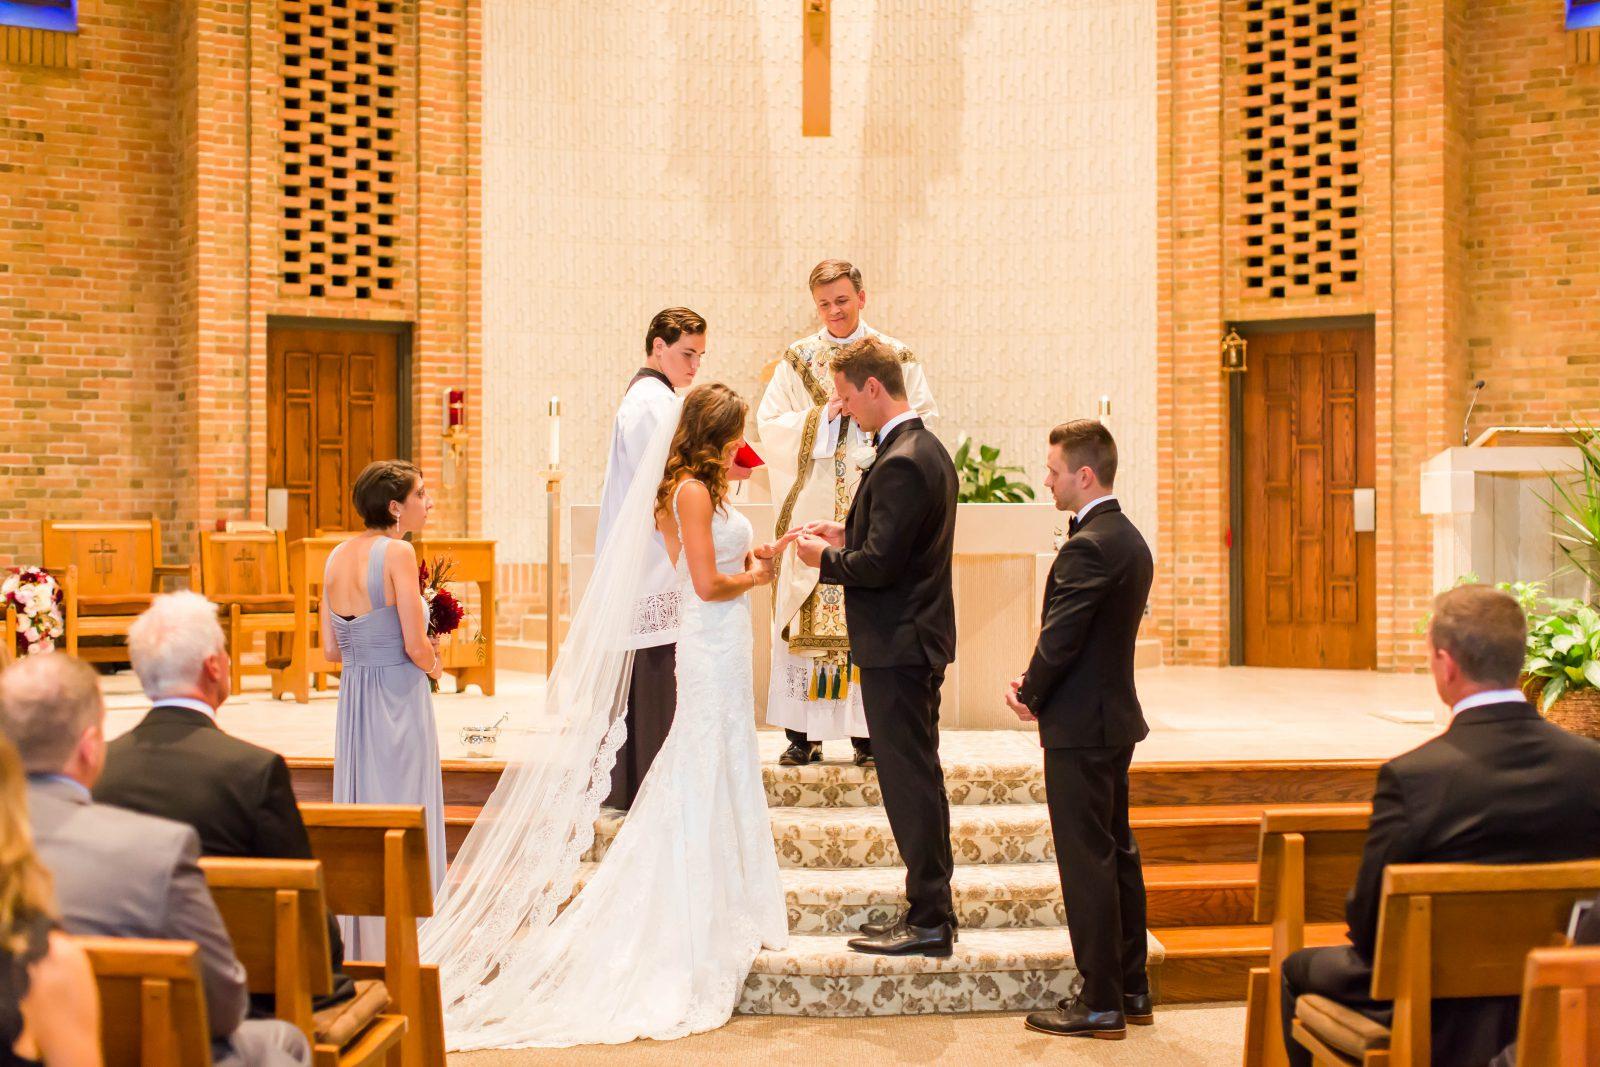 sunny-hill-wedding-venue-loren-jackson-photography-29